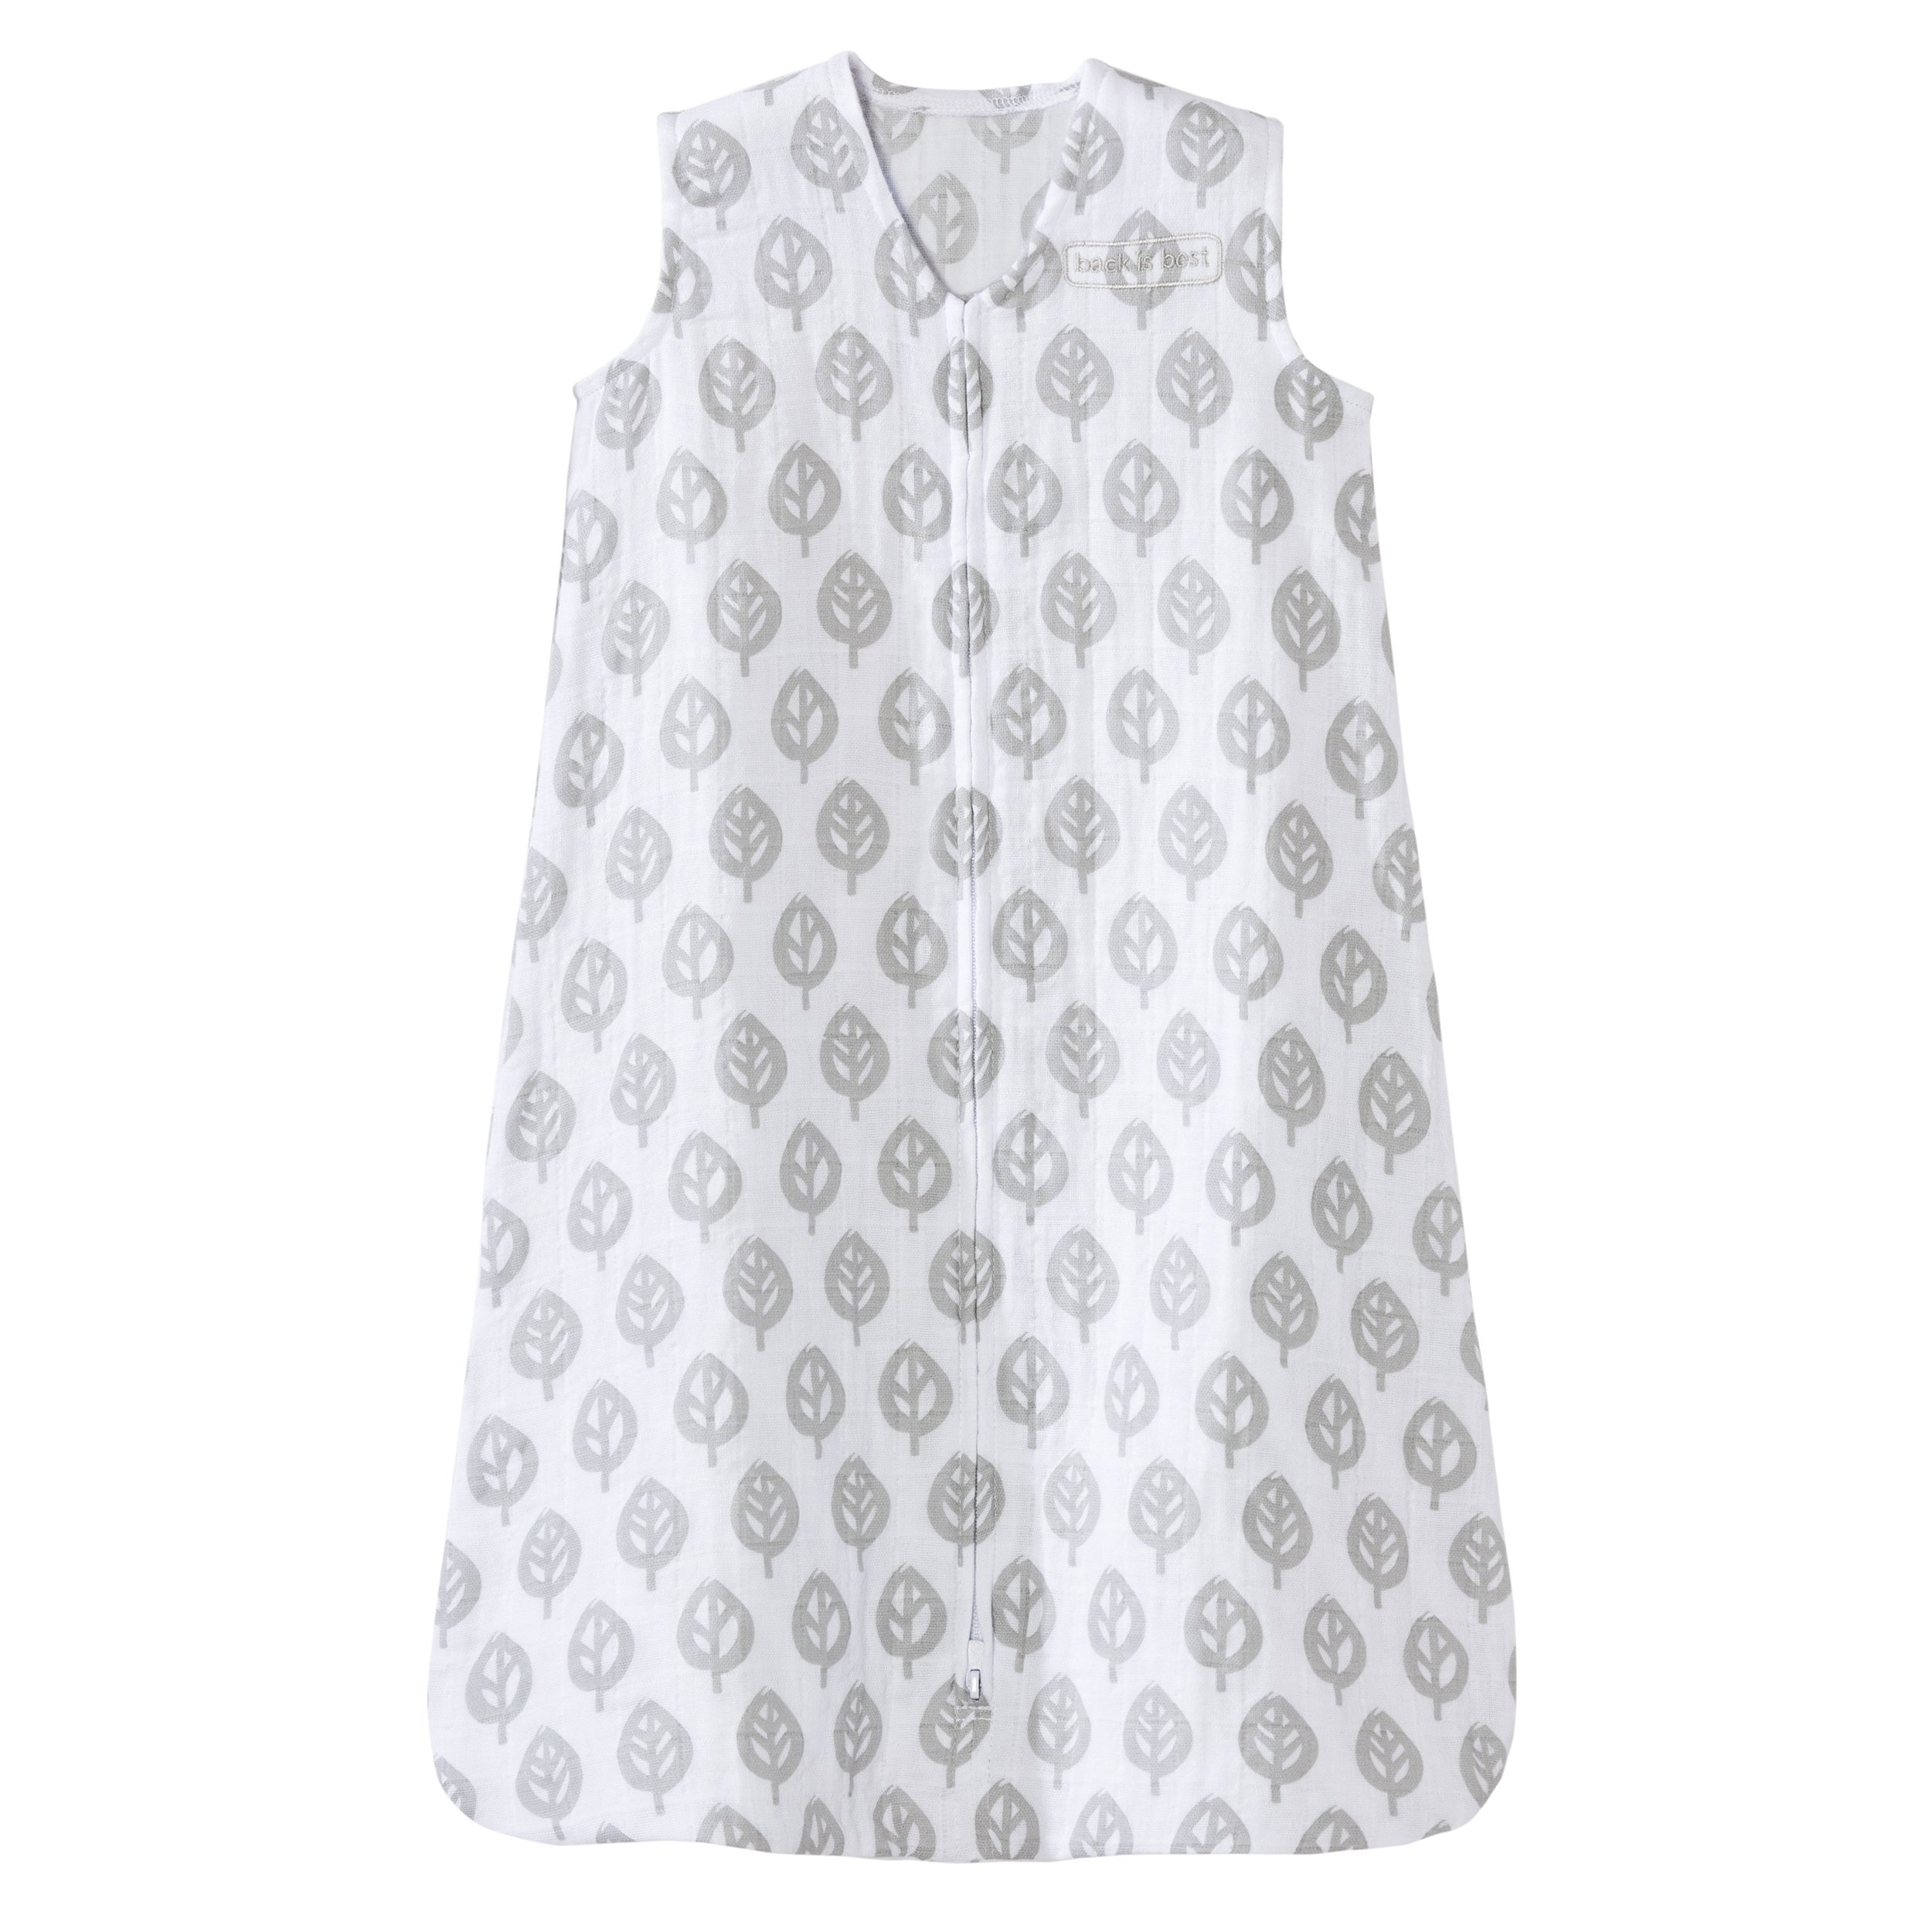 HALO 100% Cotton Muslin Sleep Sack Wearable Blanket, Gray Tree Leaf, Medium